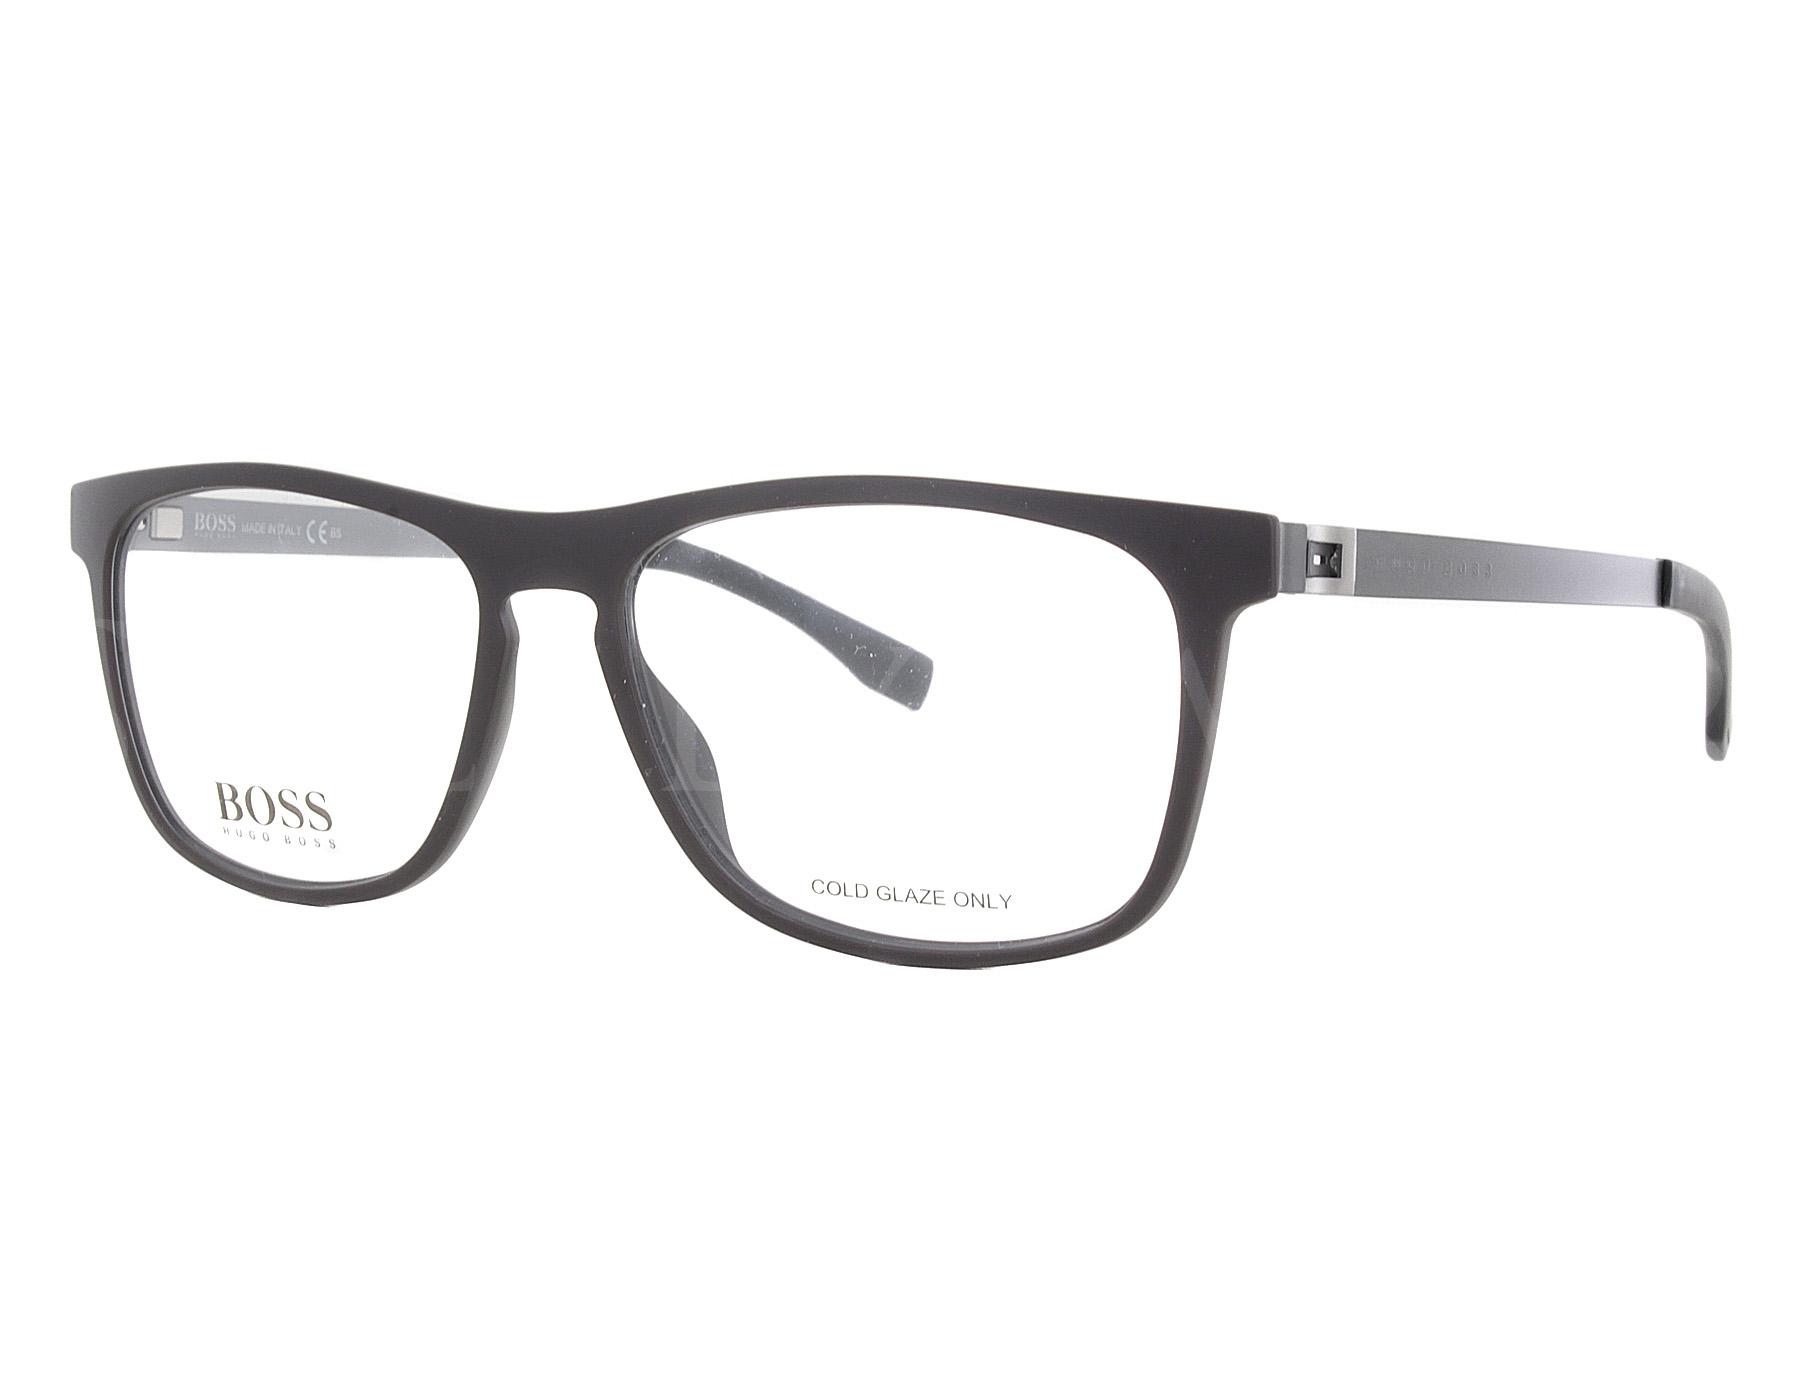 fe82b5b40e Details about NEW Hugo Boss B0840 EXJ15 54mm Brown Ruthenium Optical Eyeglasses  Frames